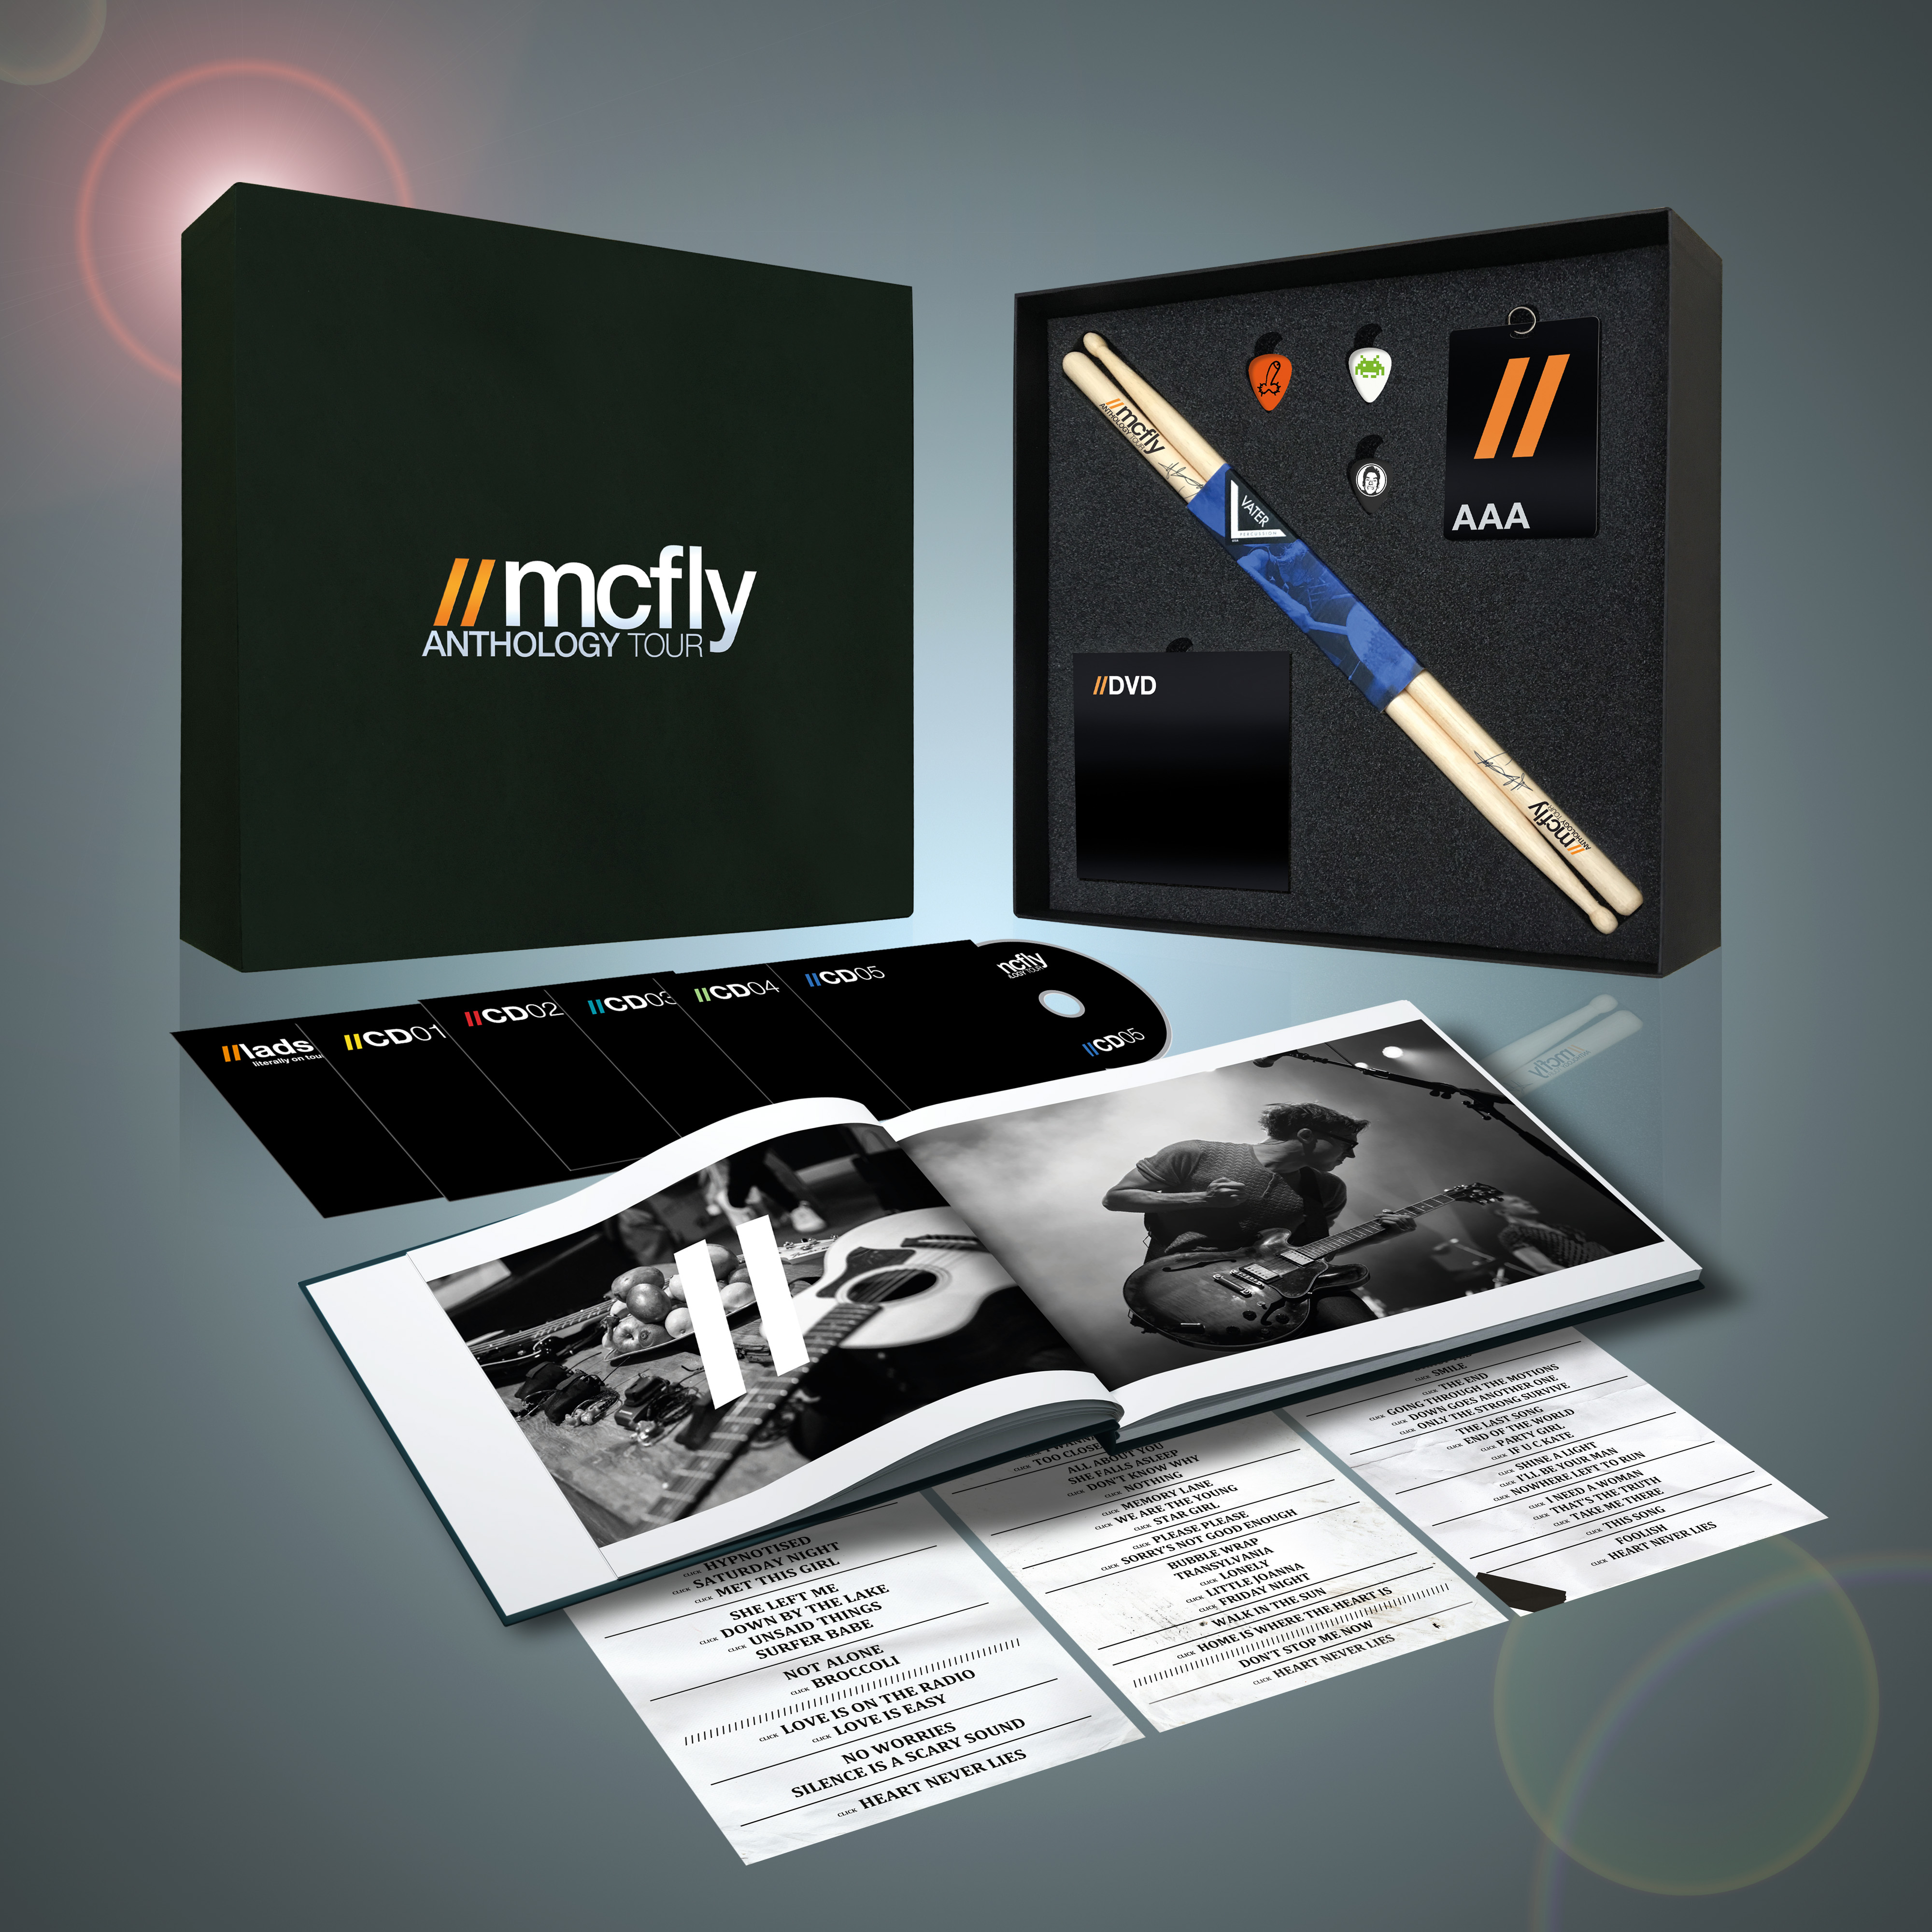 Anthology Tour Deluxe Boxset (Limited Edition) - McFly